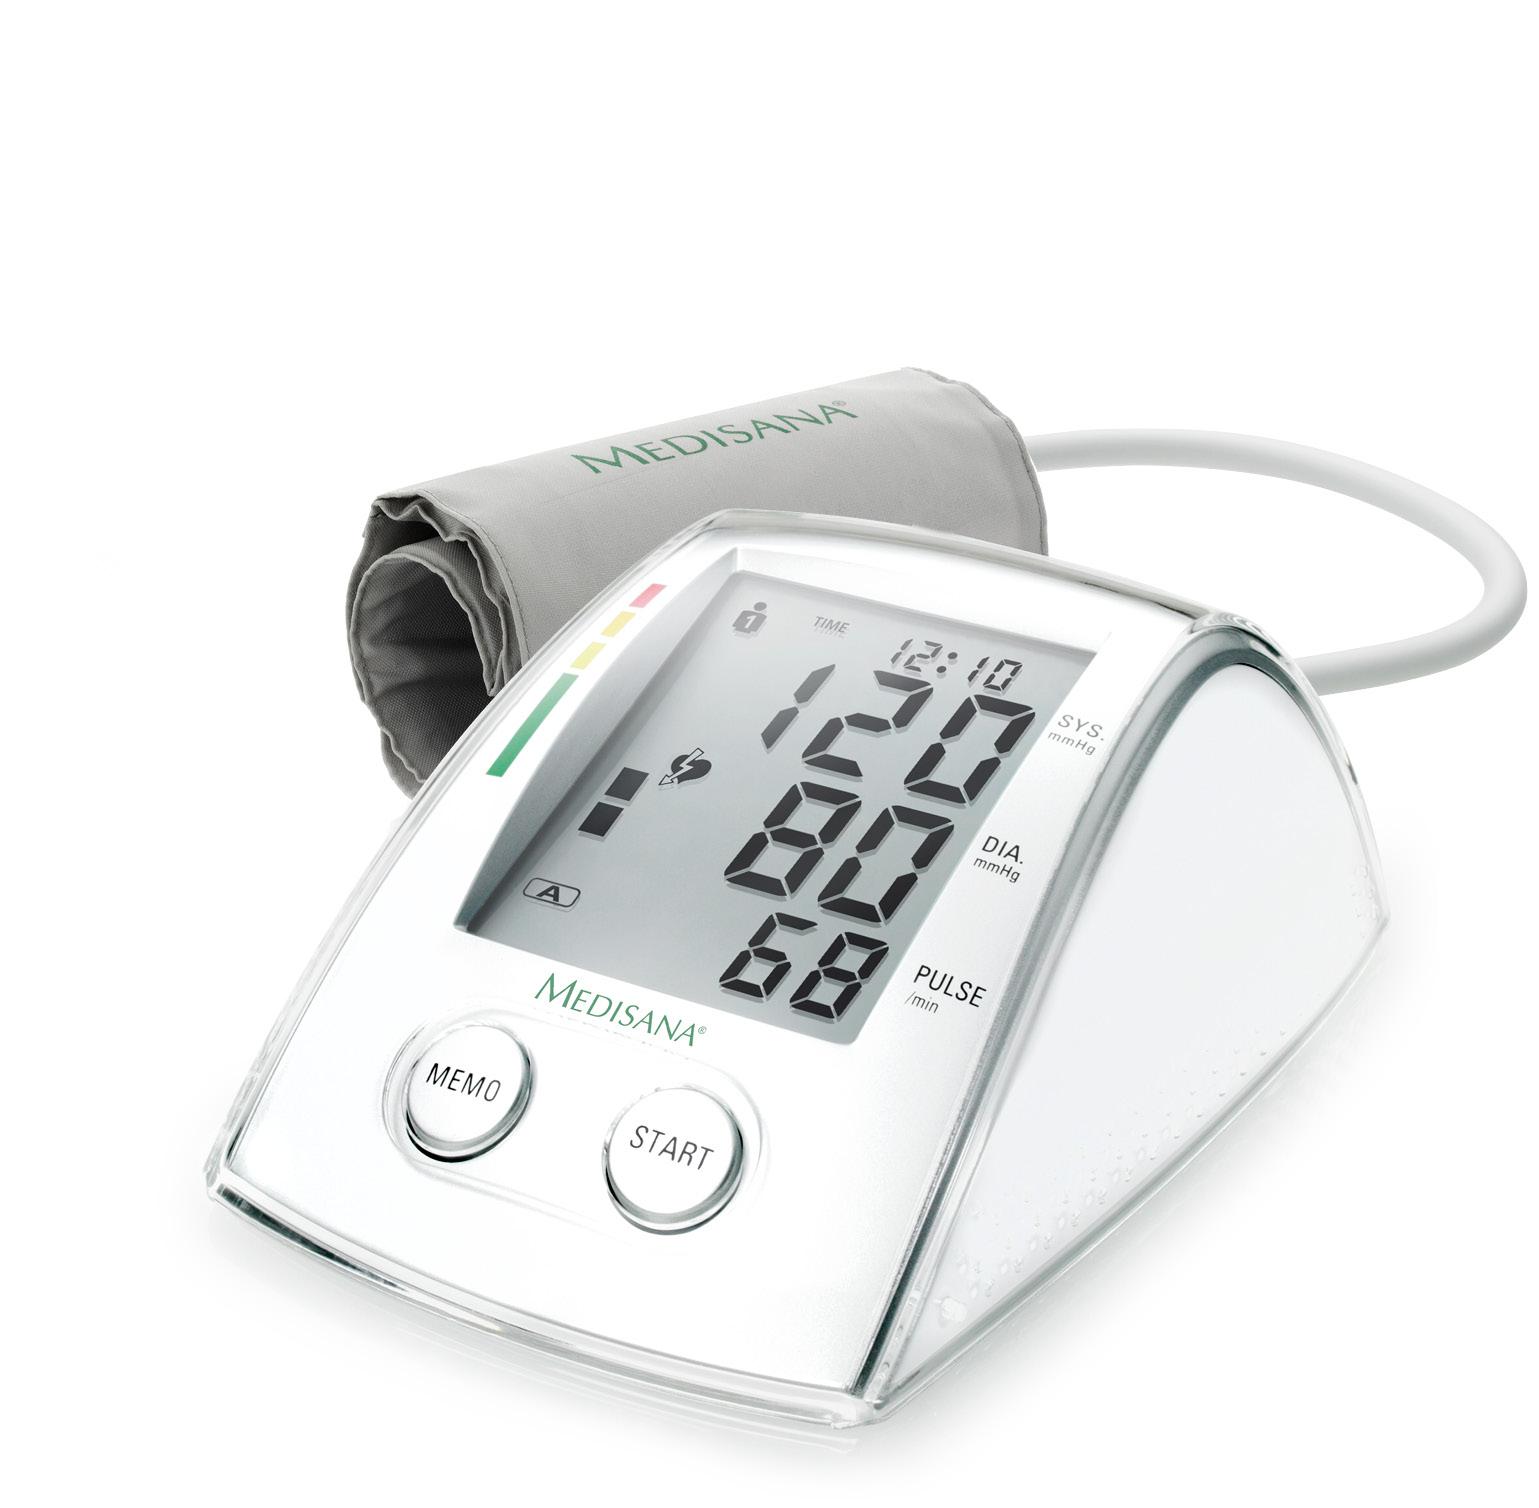 Image of Medisana armbloedrukmeter mtx